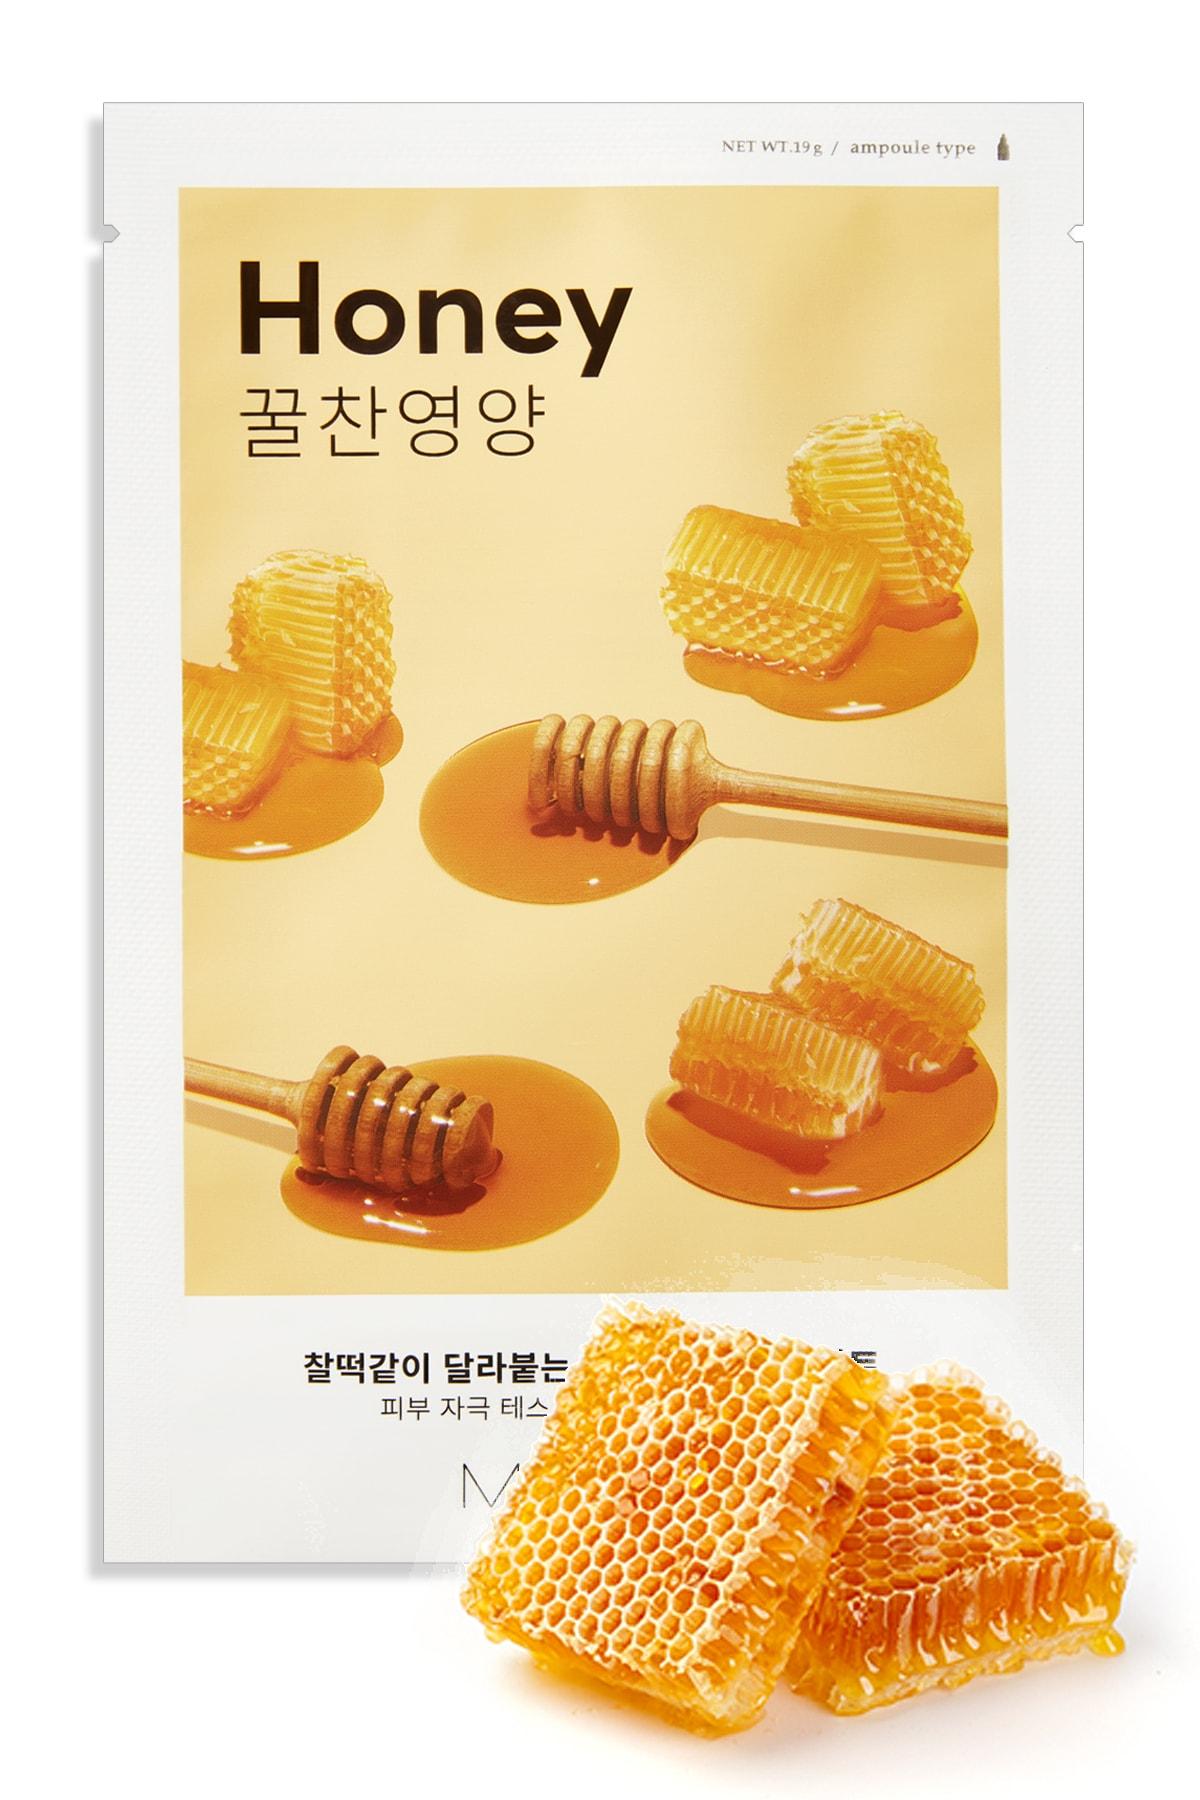 Missha Bal İçerikli Yoğun Nemlendirici Yaprak Maske (1ad) Airy Fit Sheet Mask Honey 0